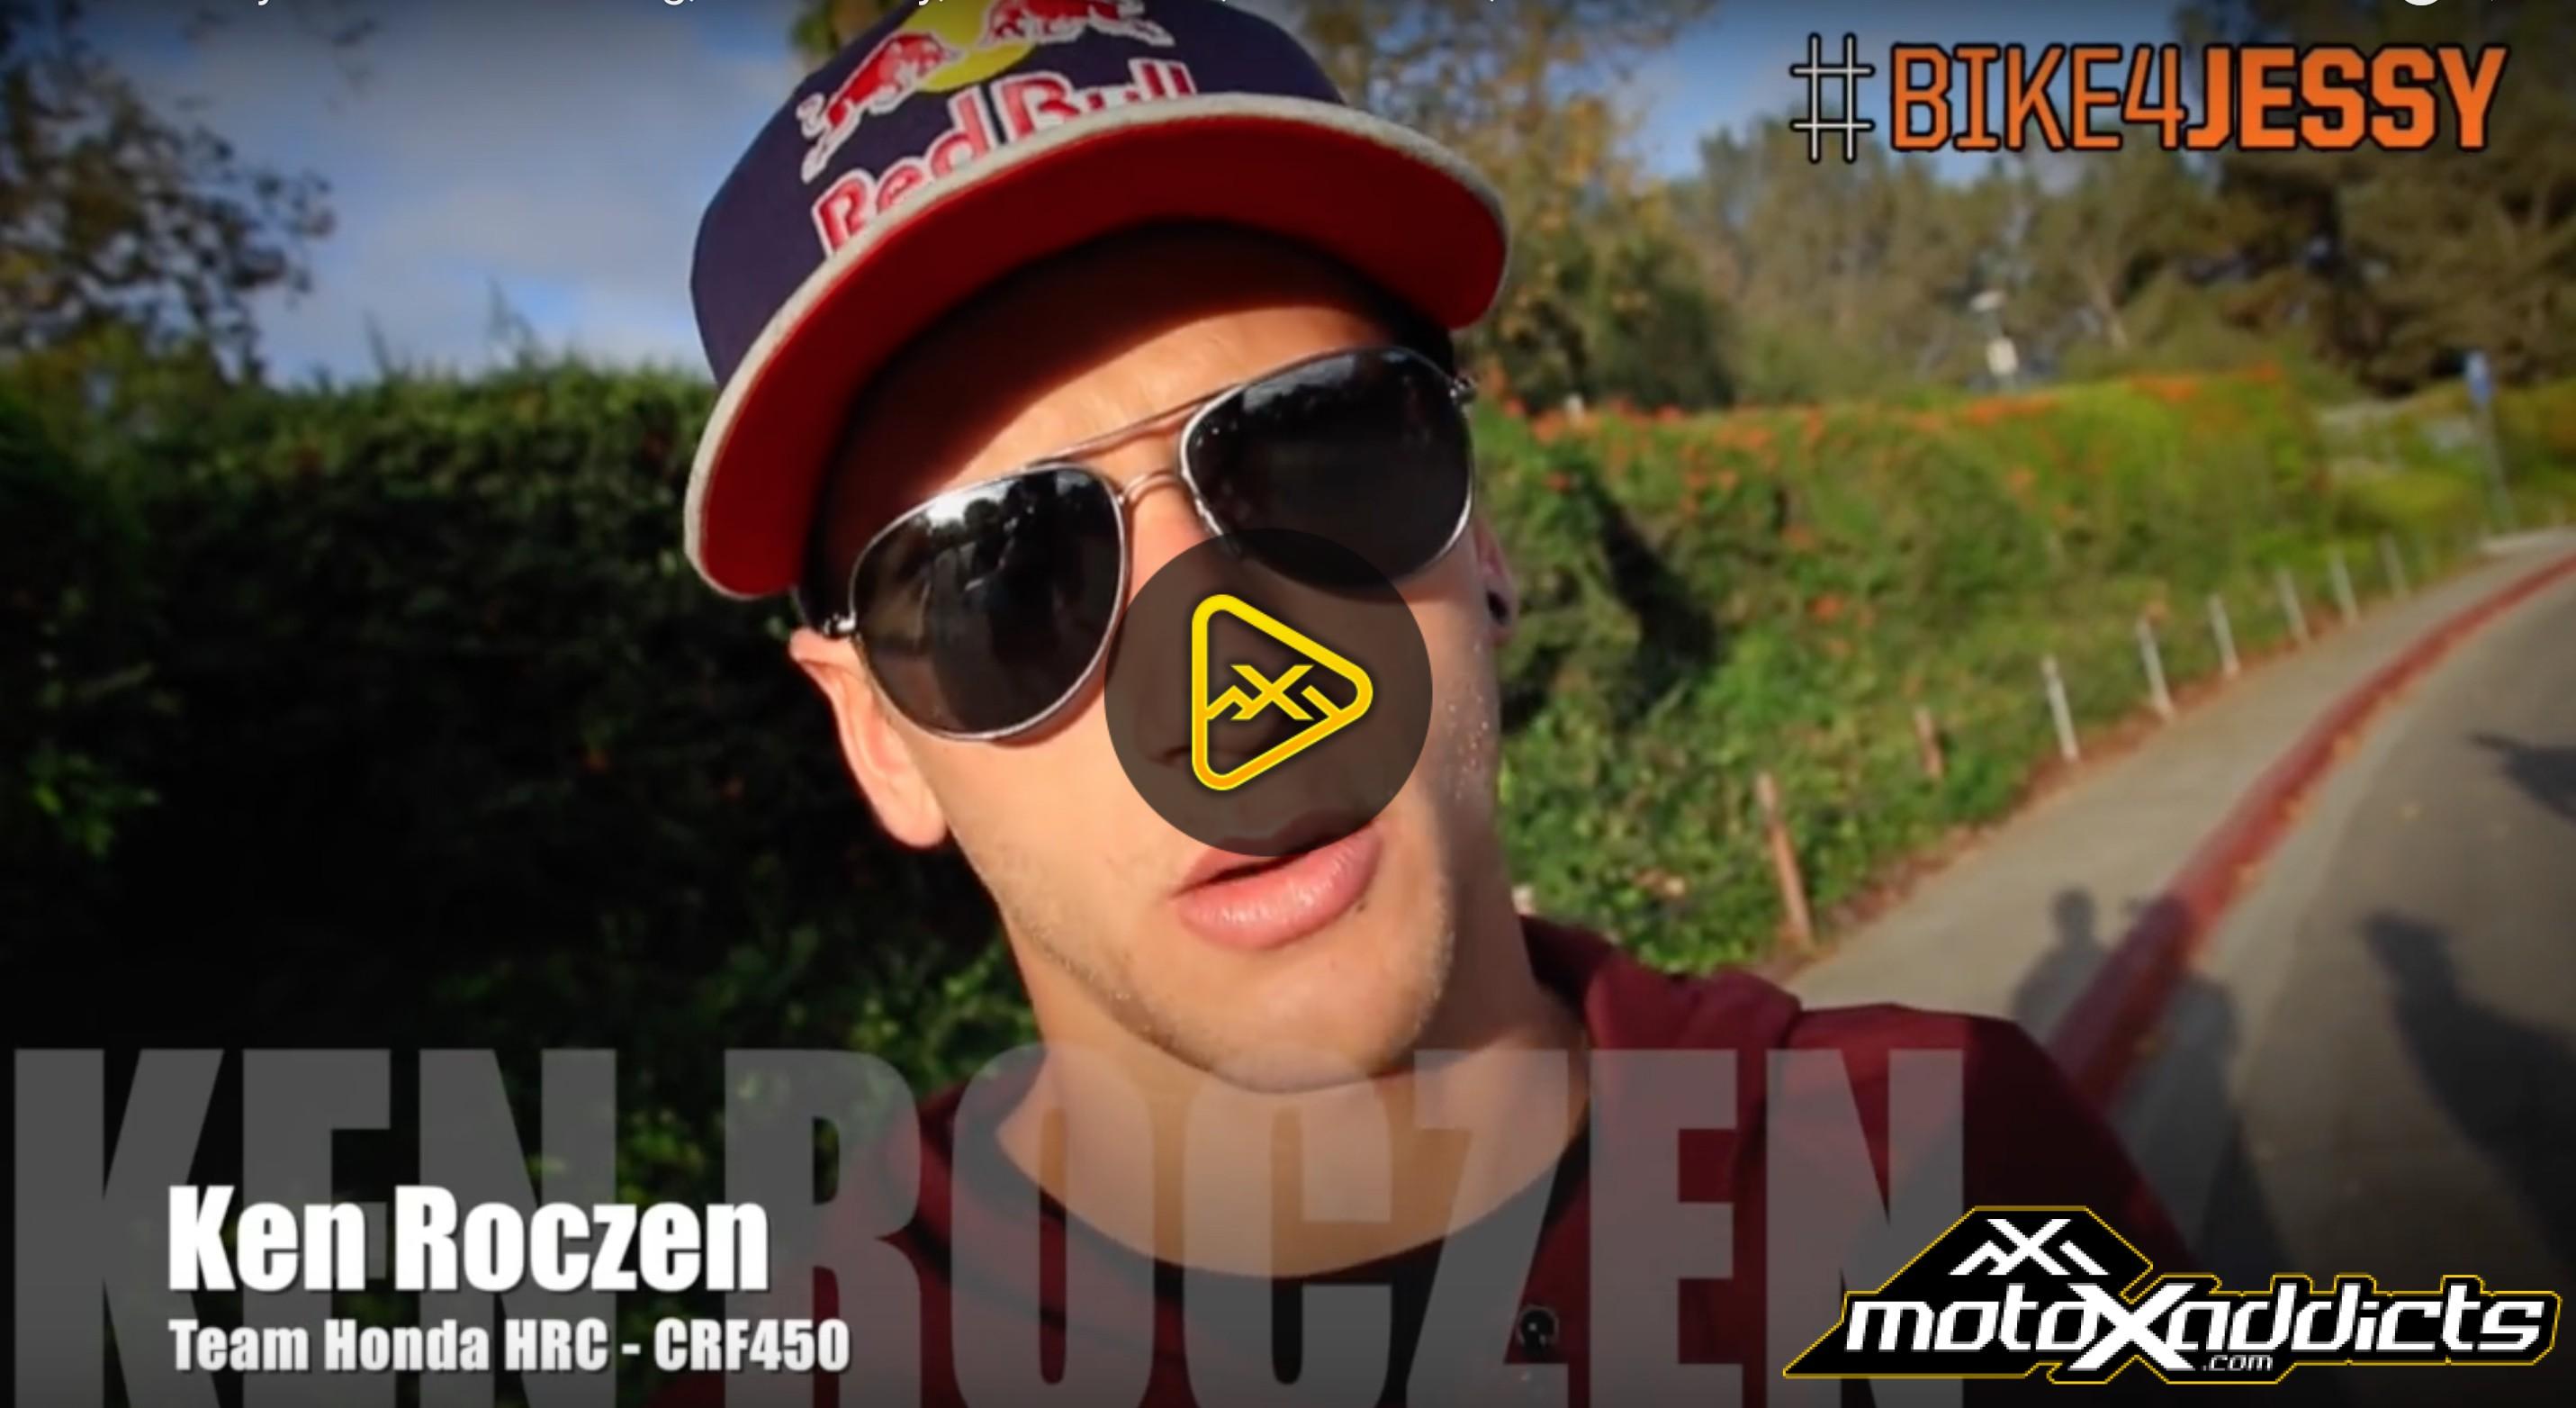 Bike4Jessy w/ Christian Craig, Cole Seely, Ken Roczen, Broc Tickle, Shane McElrath…